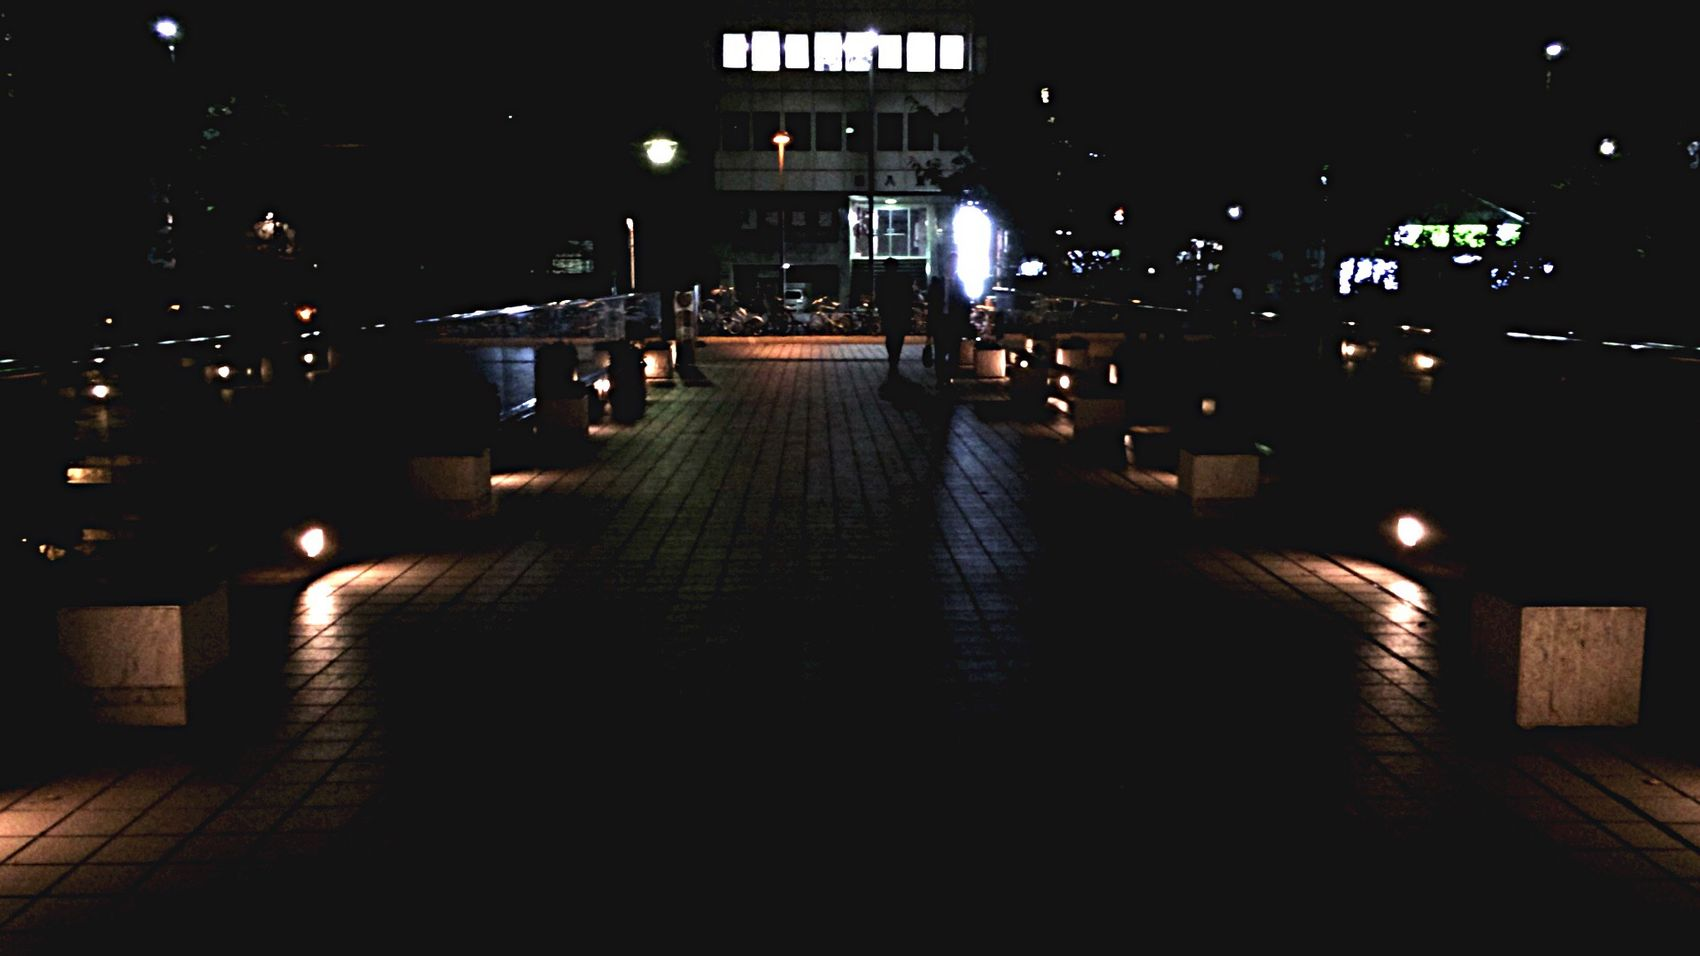 Streamzoo Streamzoofamily Taking Photos Streetphotography Nightphotography 🚶🏻🚶🏻🚶🏻🚶🏻😌✋🏻🎵